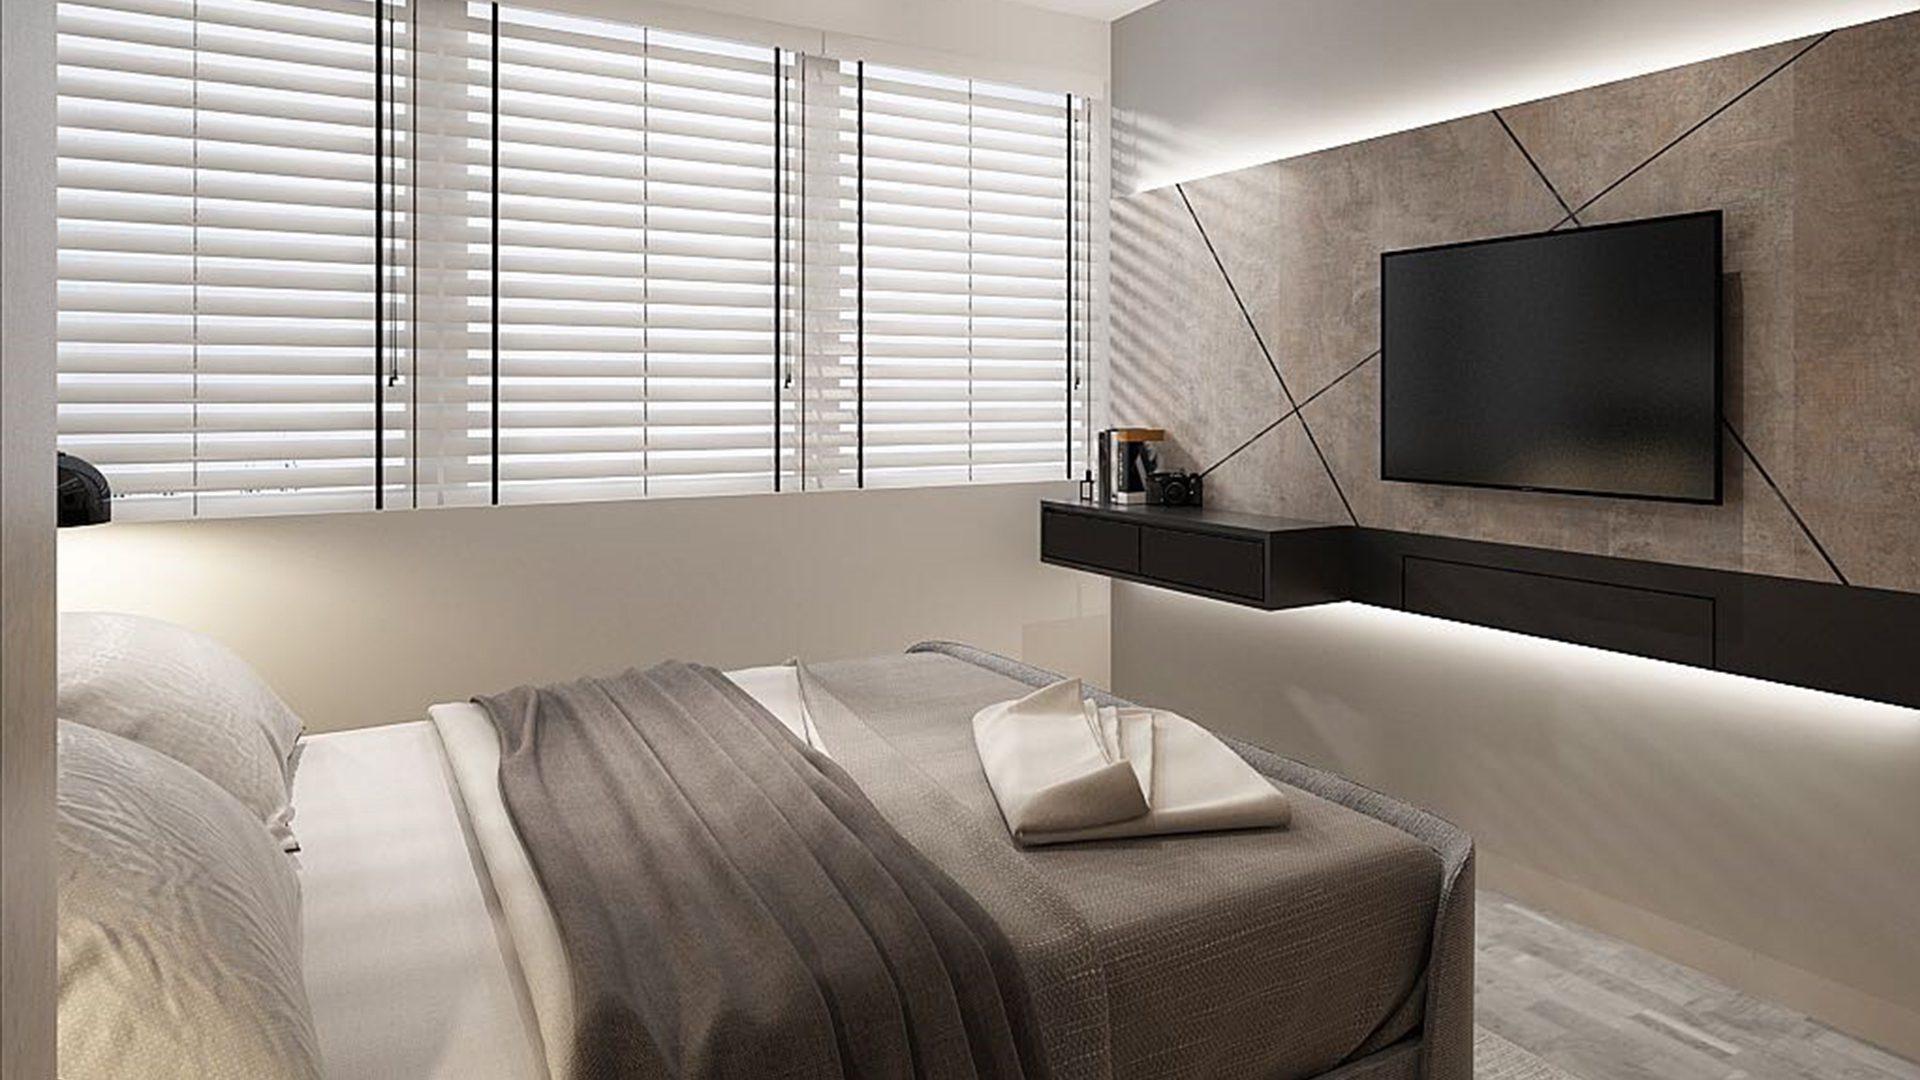 Granderu-Park-Residences-Bedroom-2_sample-interior-design1920x1080_Home-Quarters-SG_KC-Ng-Keng-Chong.jpg